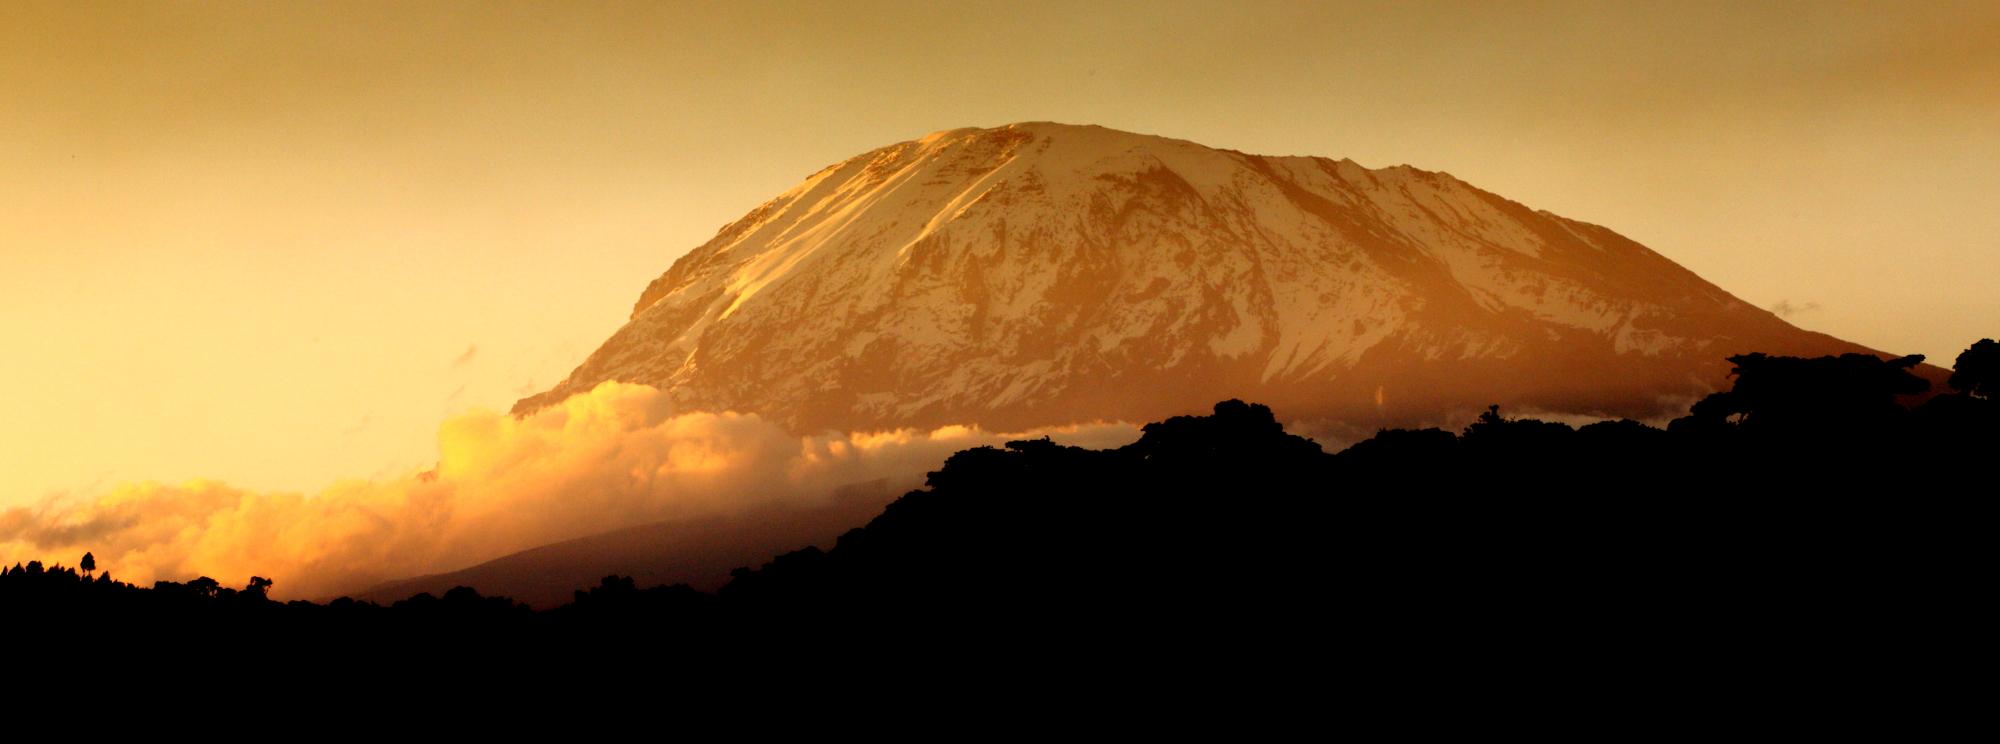 Mount Kilimanjaro, Tanzania, June 2013